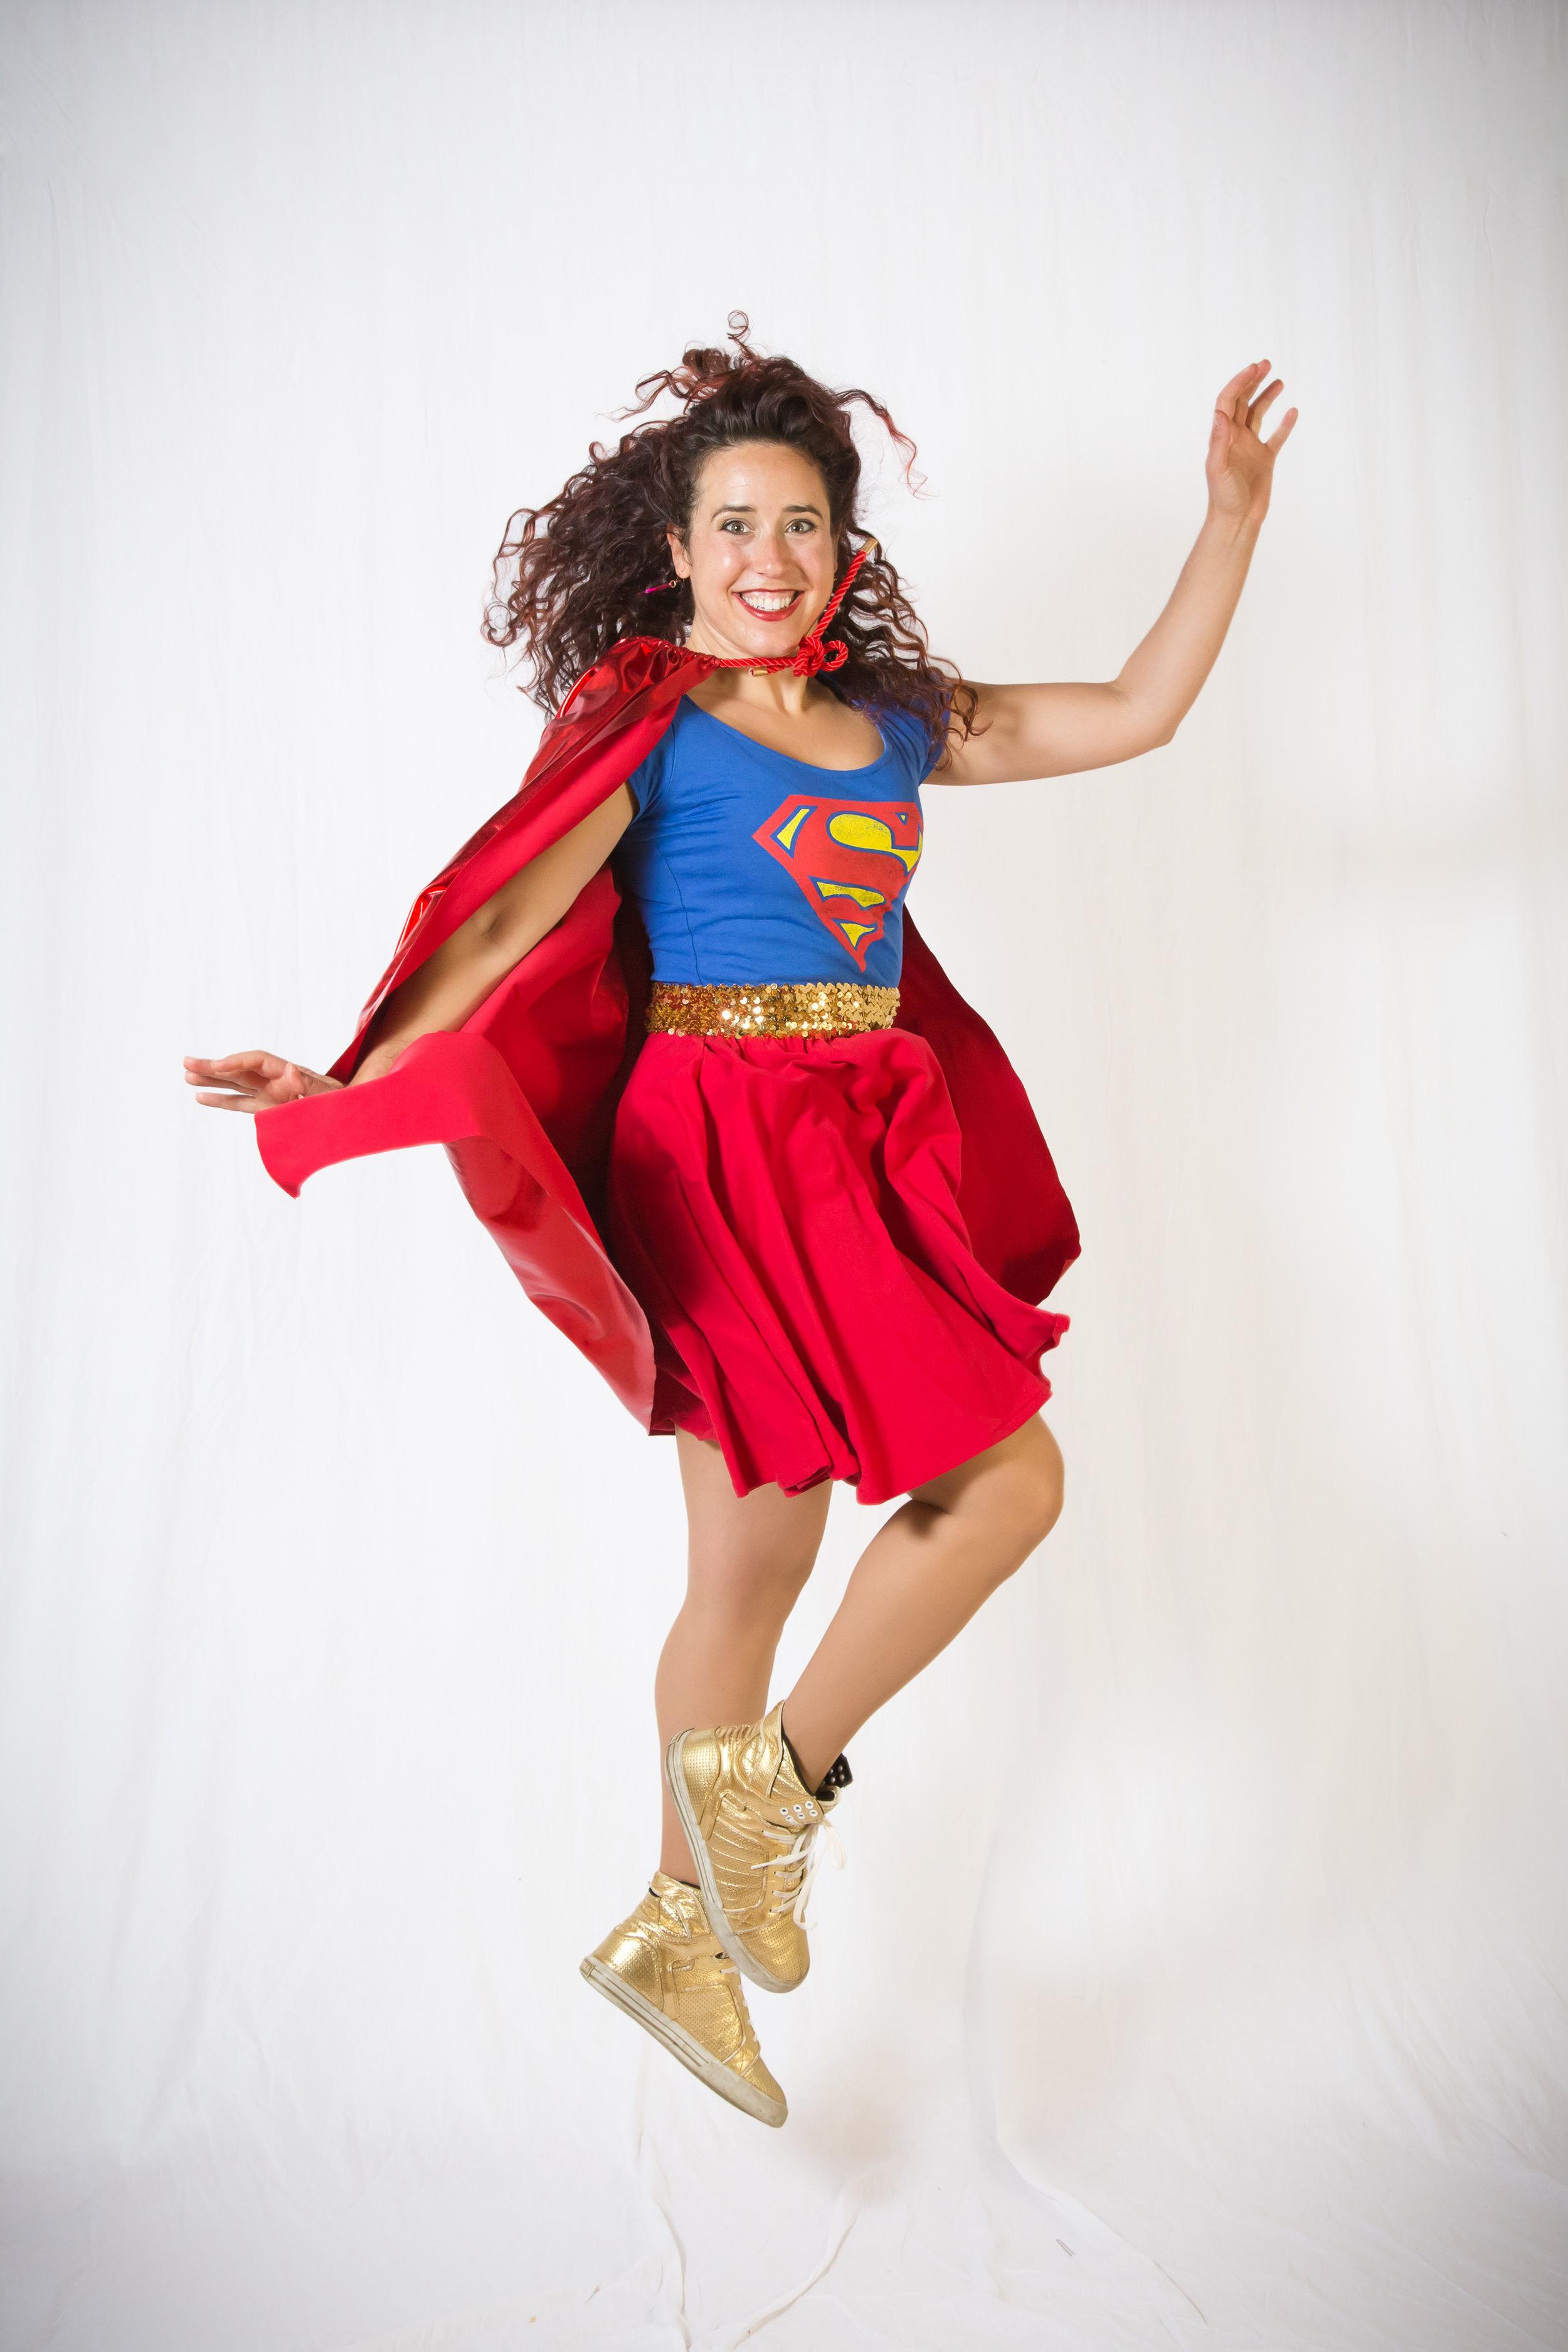 Windy Super Girl.jpg